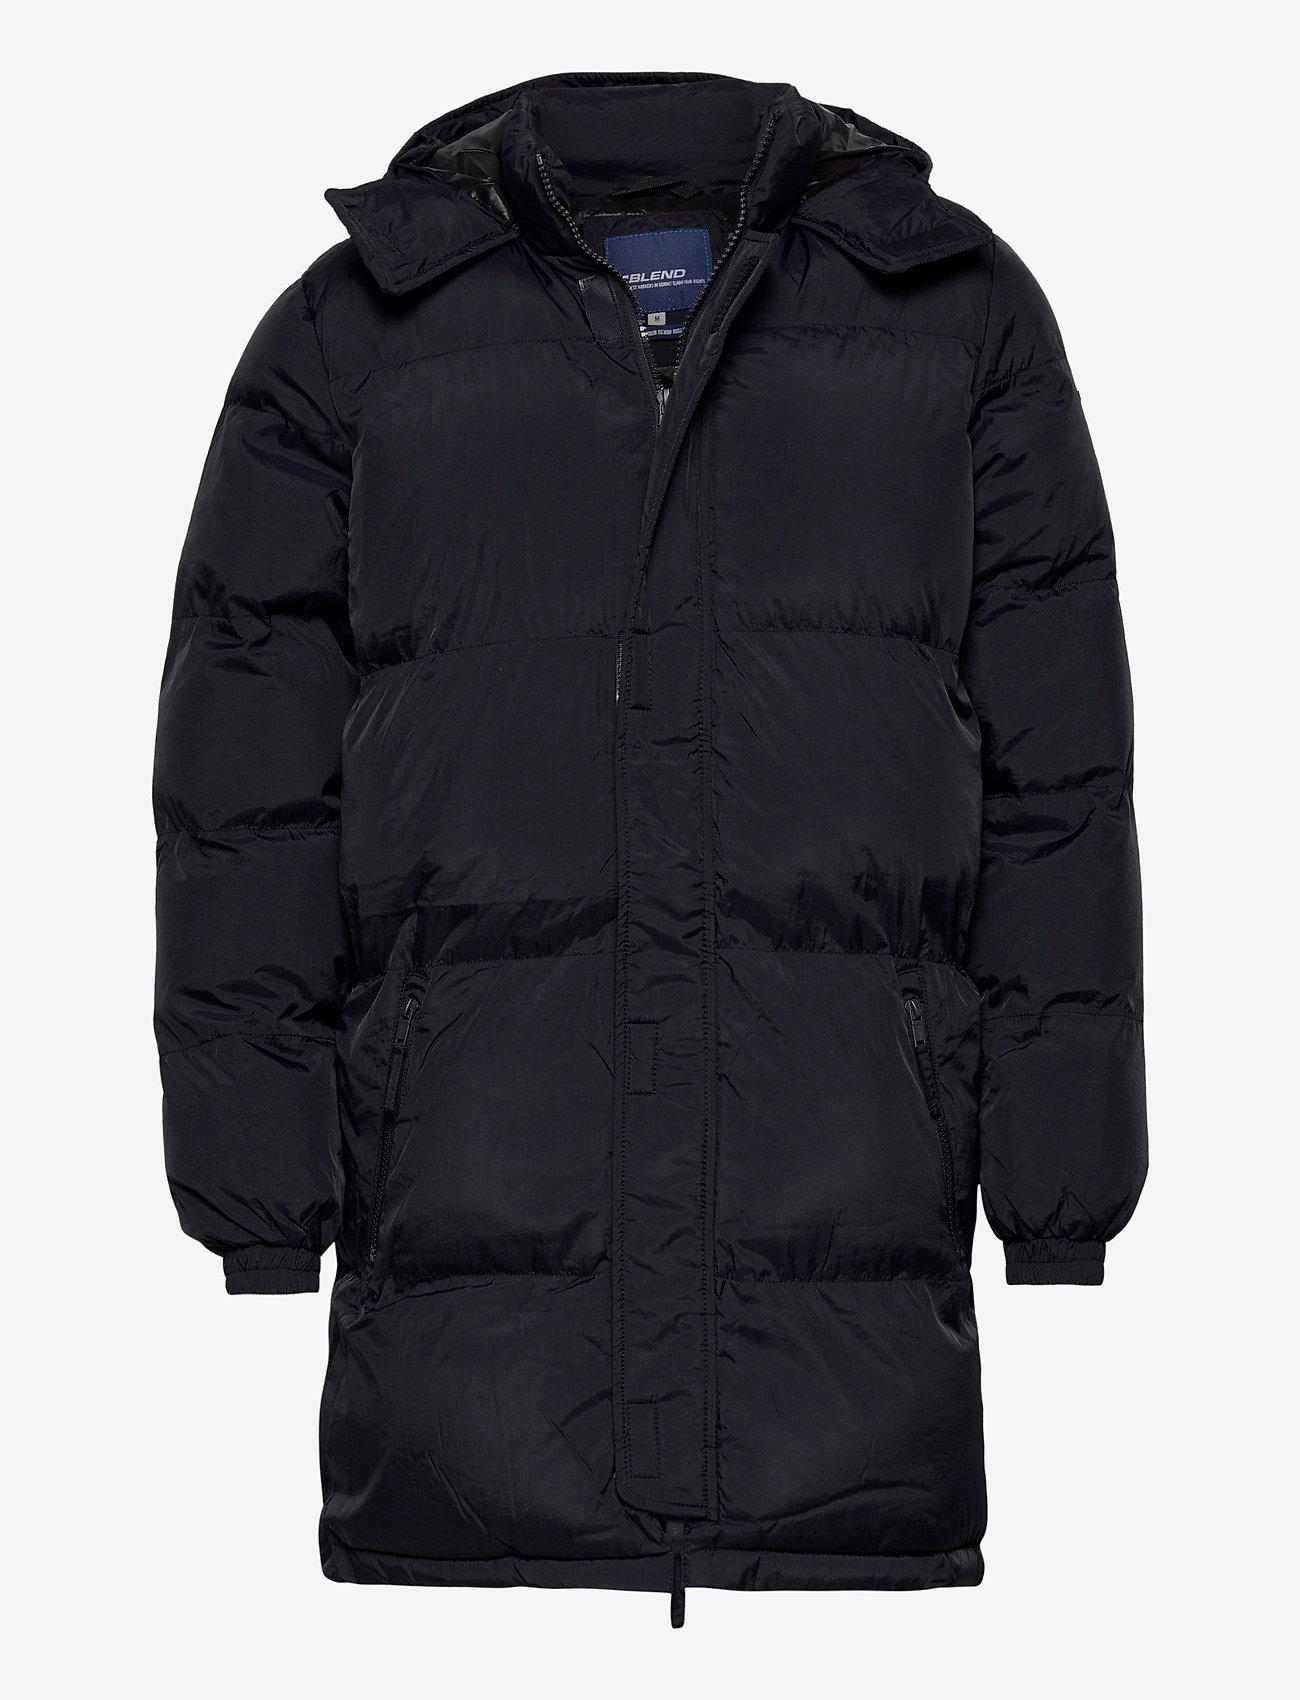 Blend - Outerwear - padded jackets - dark navy - 0